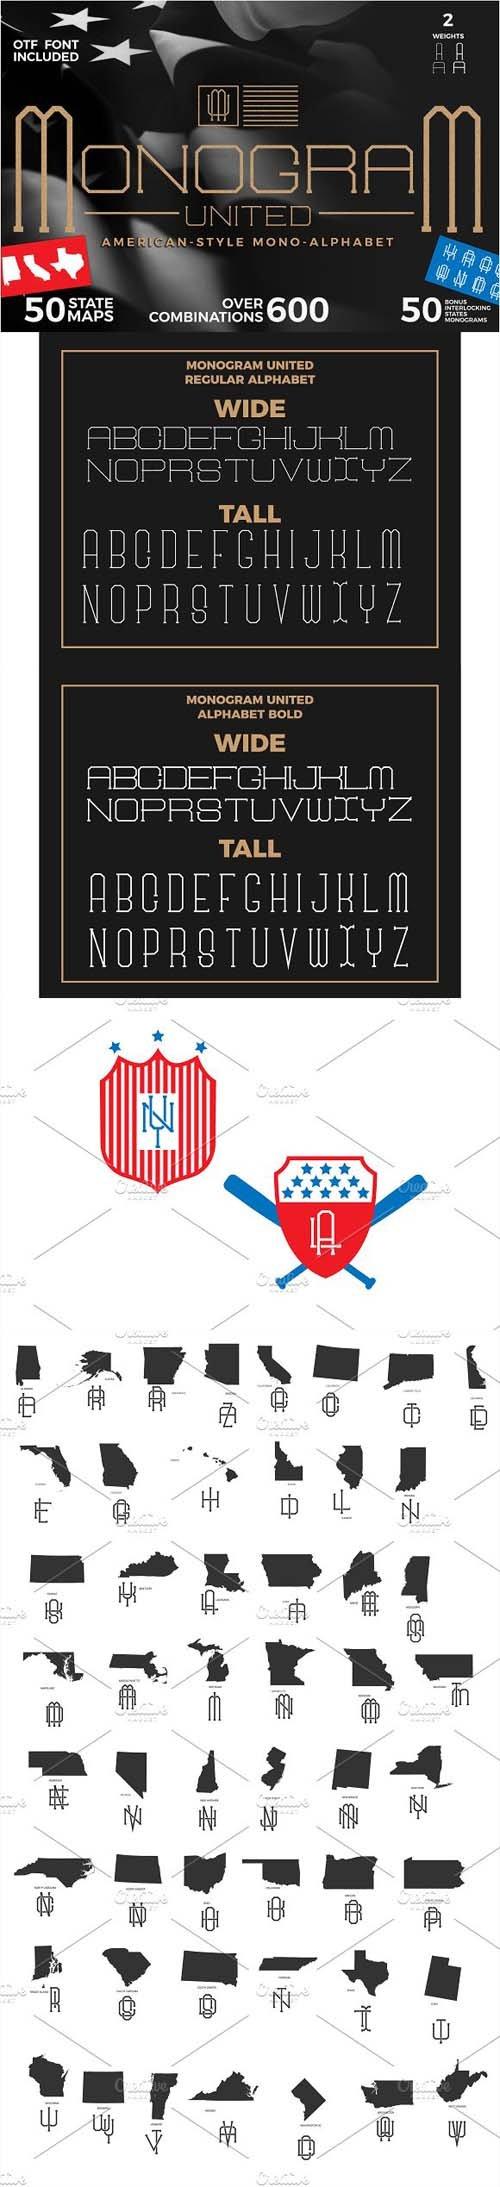 Monogram Font Type font Serif 1330746